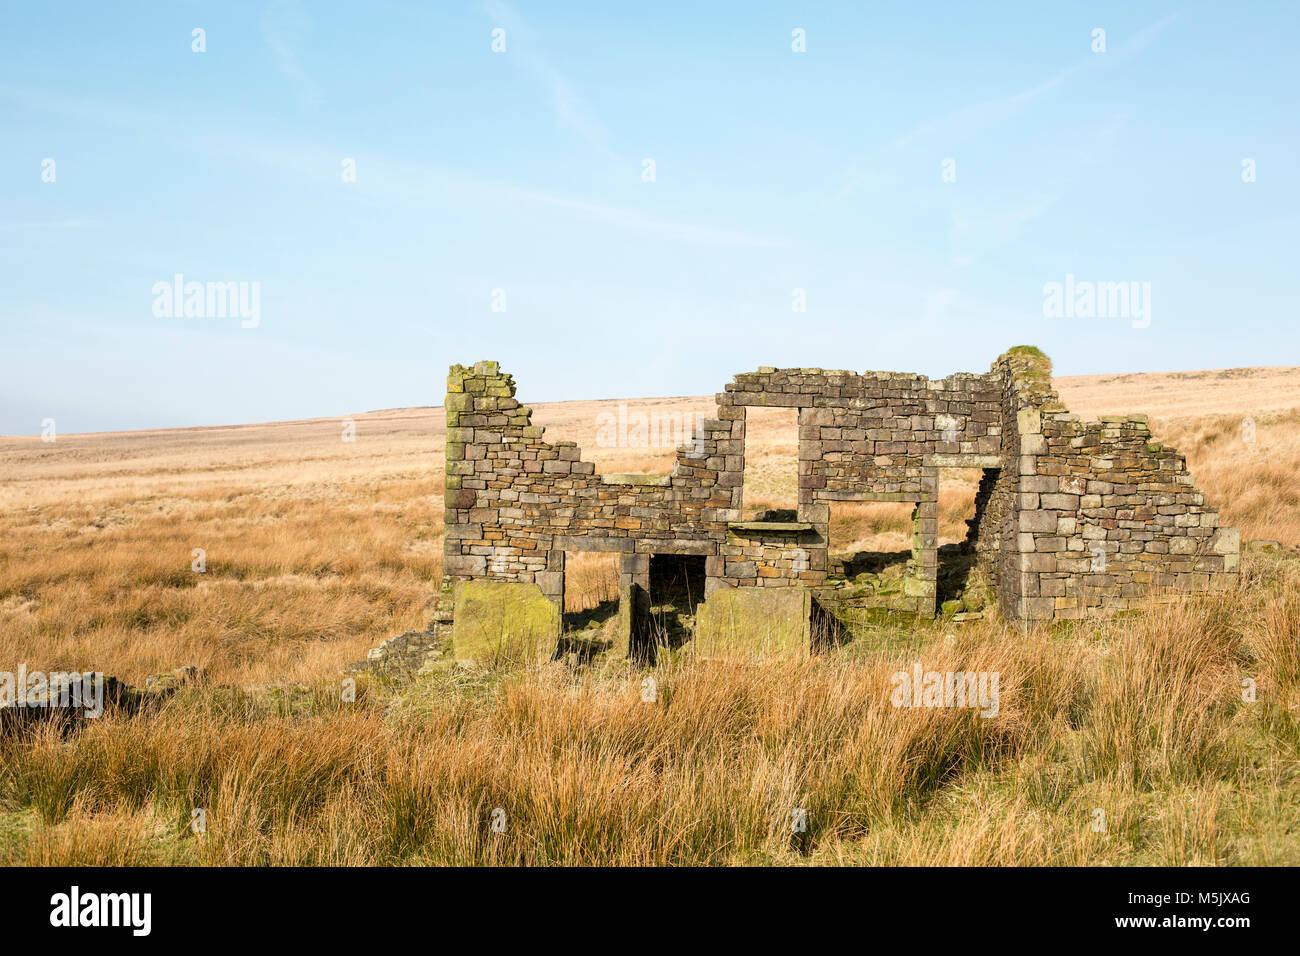 West Pennine Moors Stock Photos & West Pennine Moors Stock Images